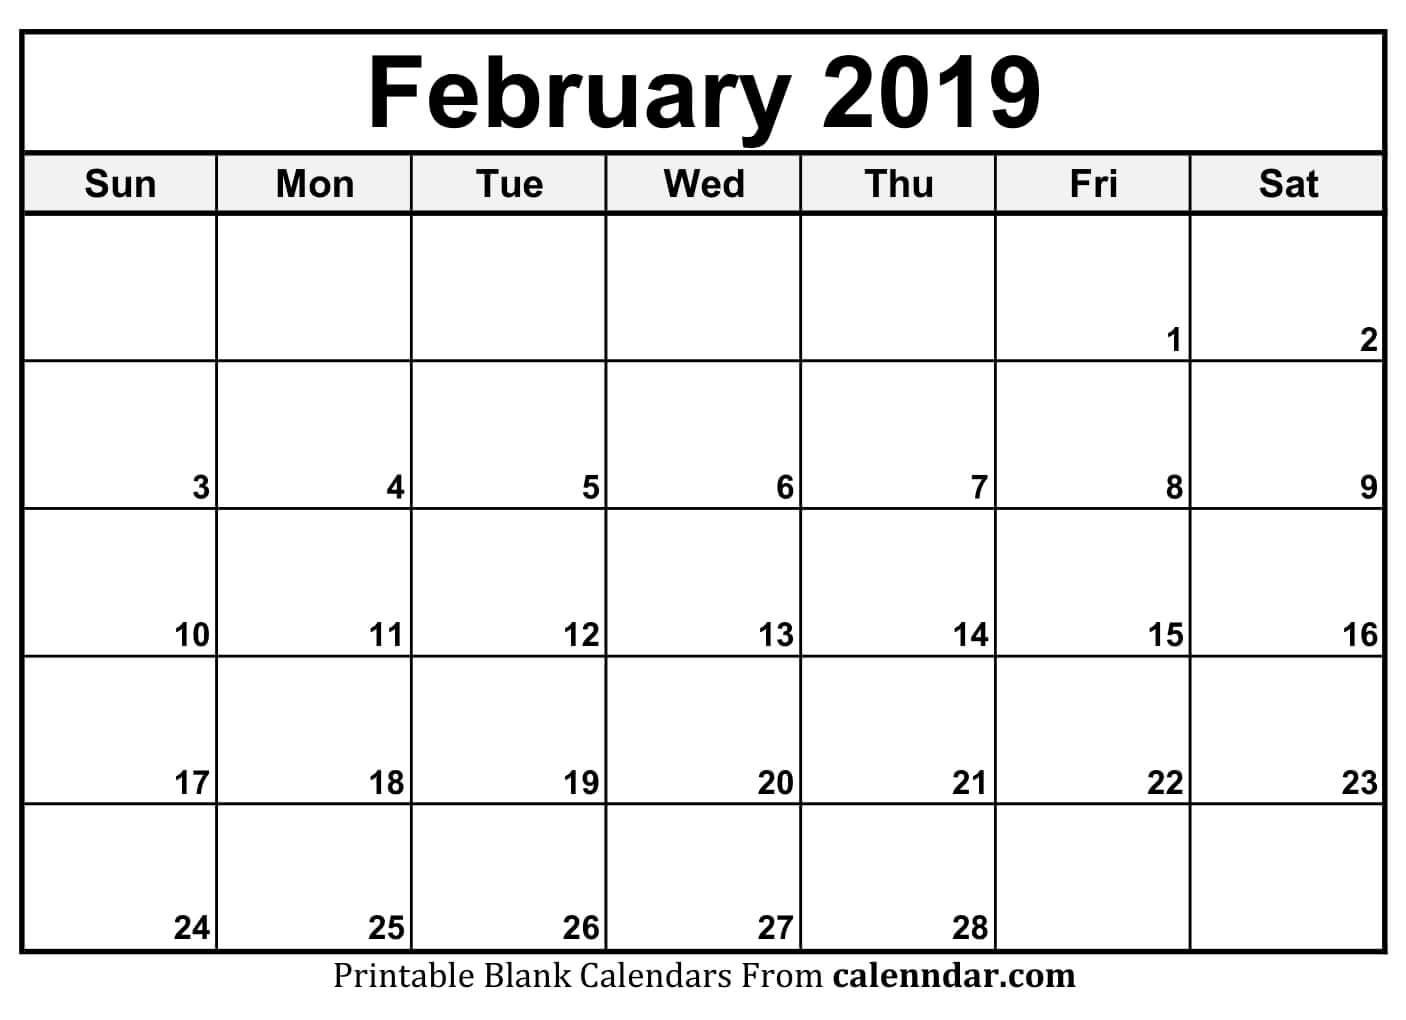 2019 February Calendar Vertex - Free Printable Calendar Templates